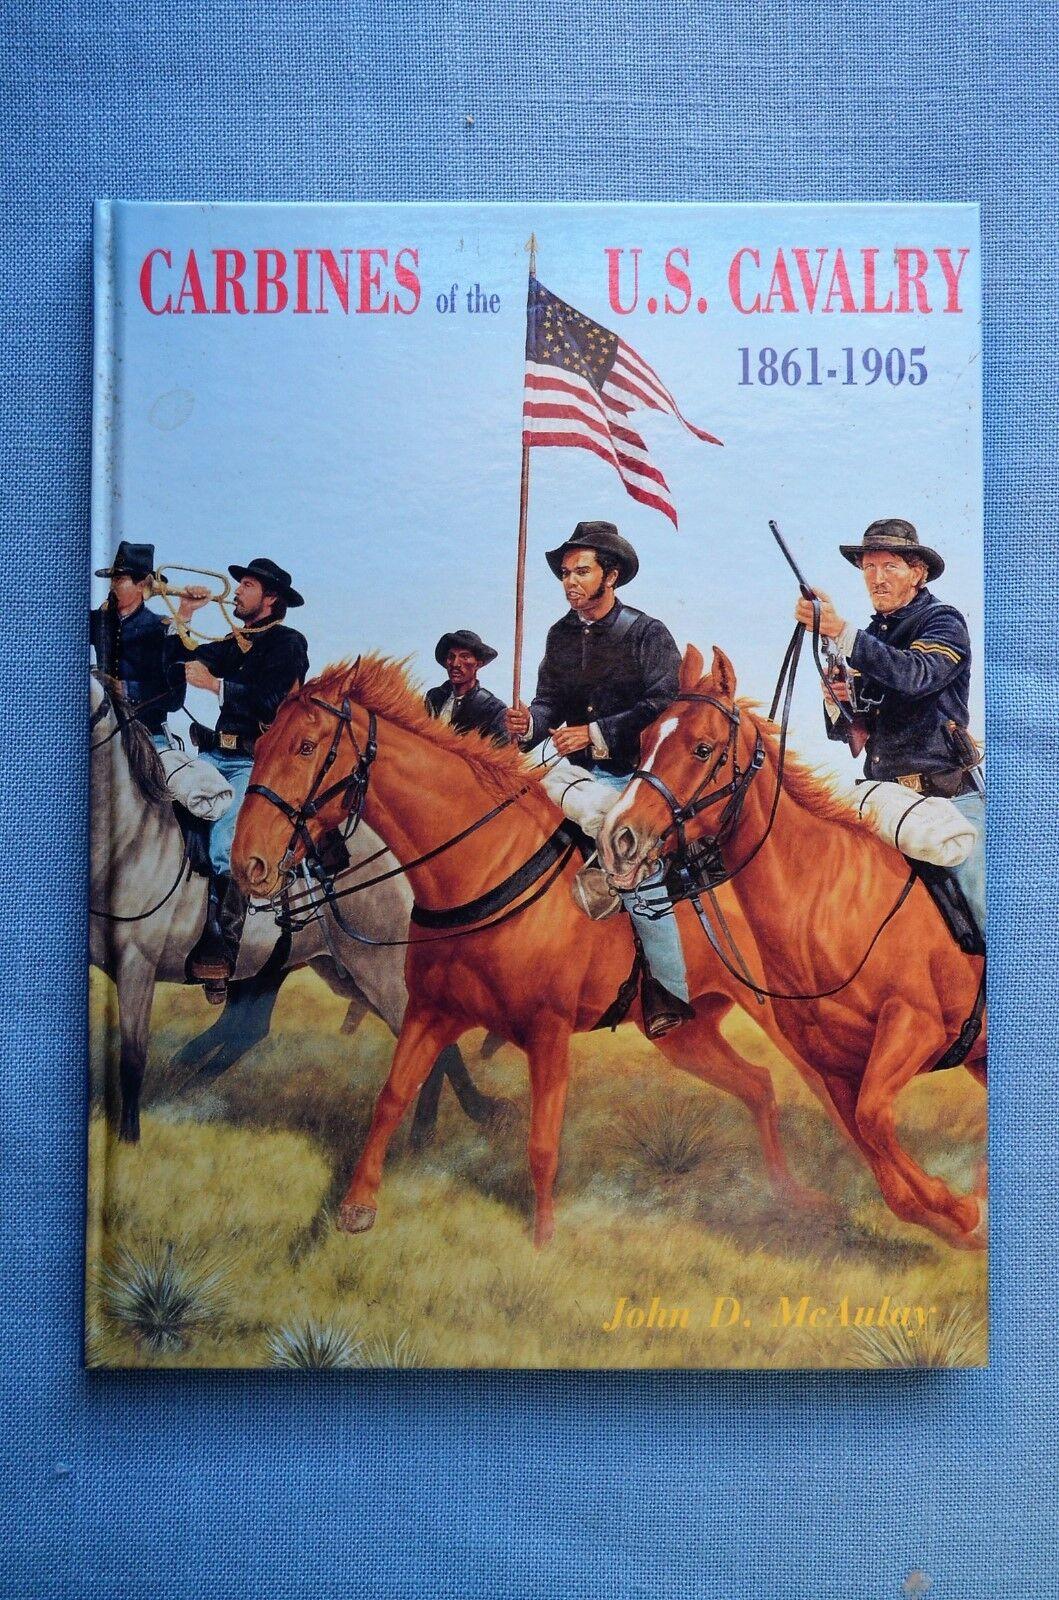 Carbines of the U.S. Cavalry McAulay 1861-1905, by John D. McAulay Cavalry 472f4a